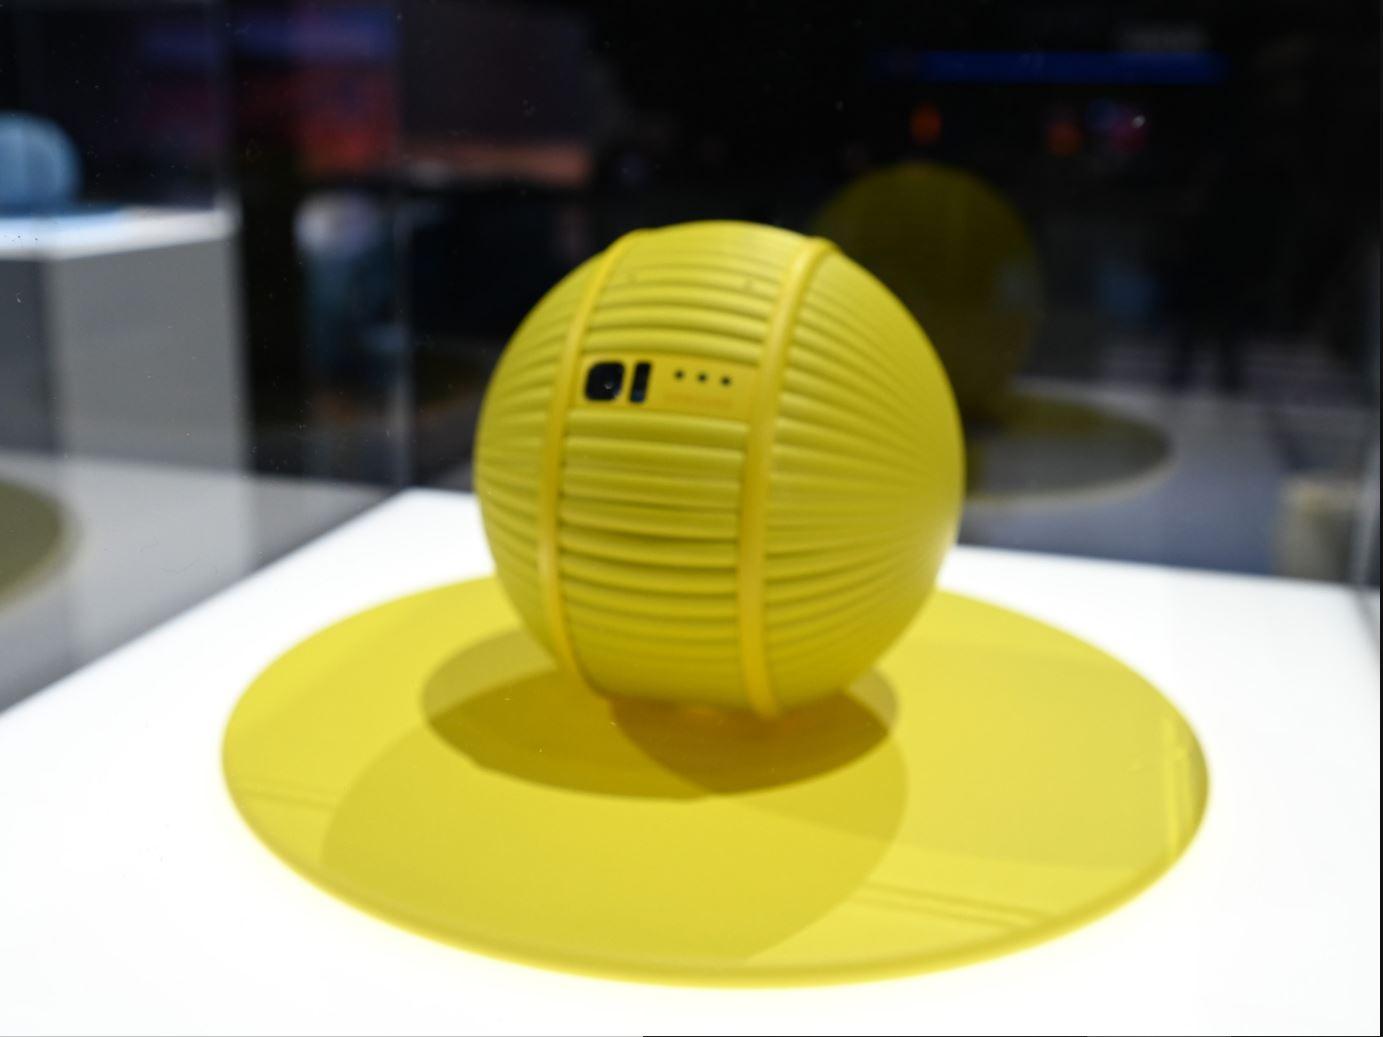 Smart Home Tech CES Las Vegas 08 Robot Butler at your service Hoey Team eXp Realty